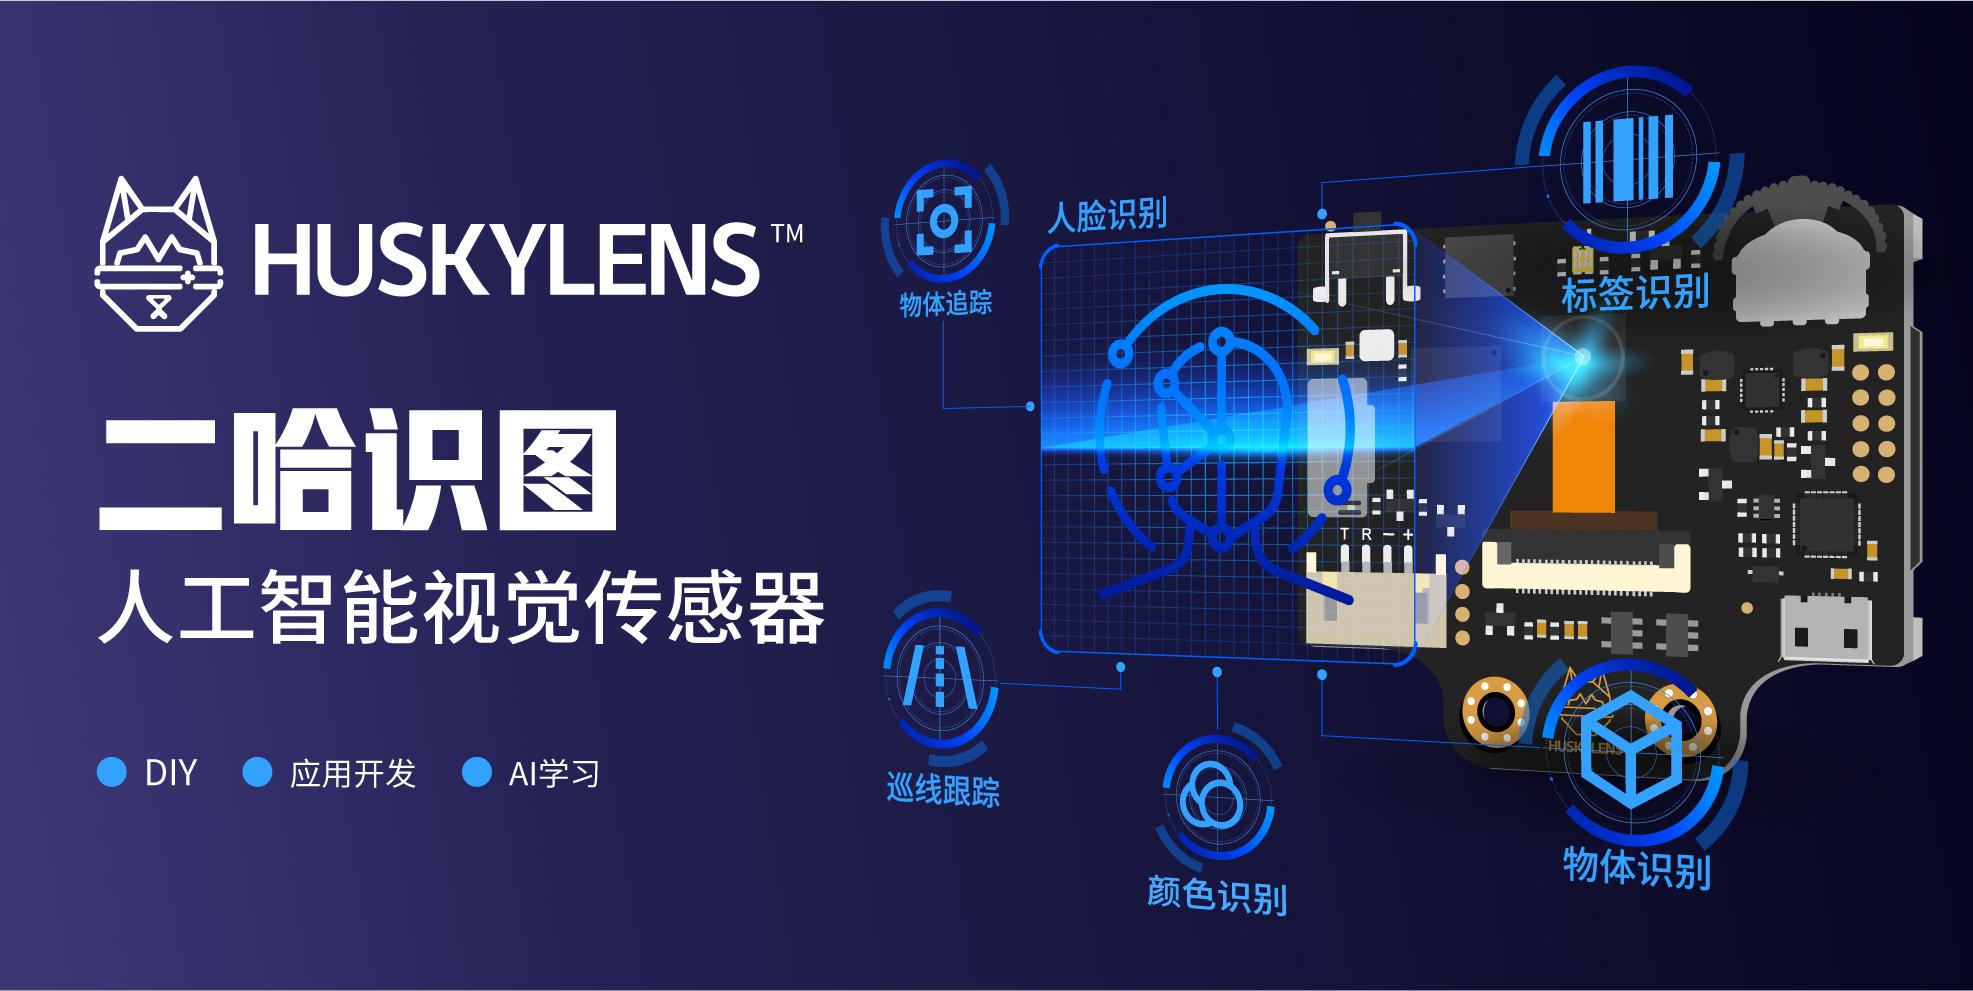 DFRobot最新创客活动-新品上市 二哈识图(HuskyLens)震撼首发